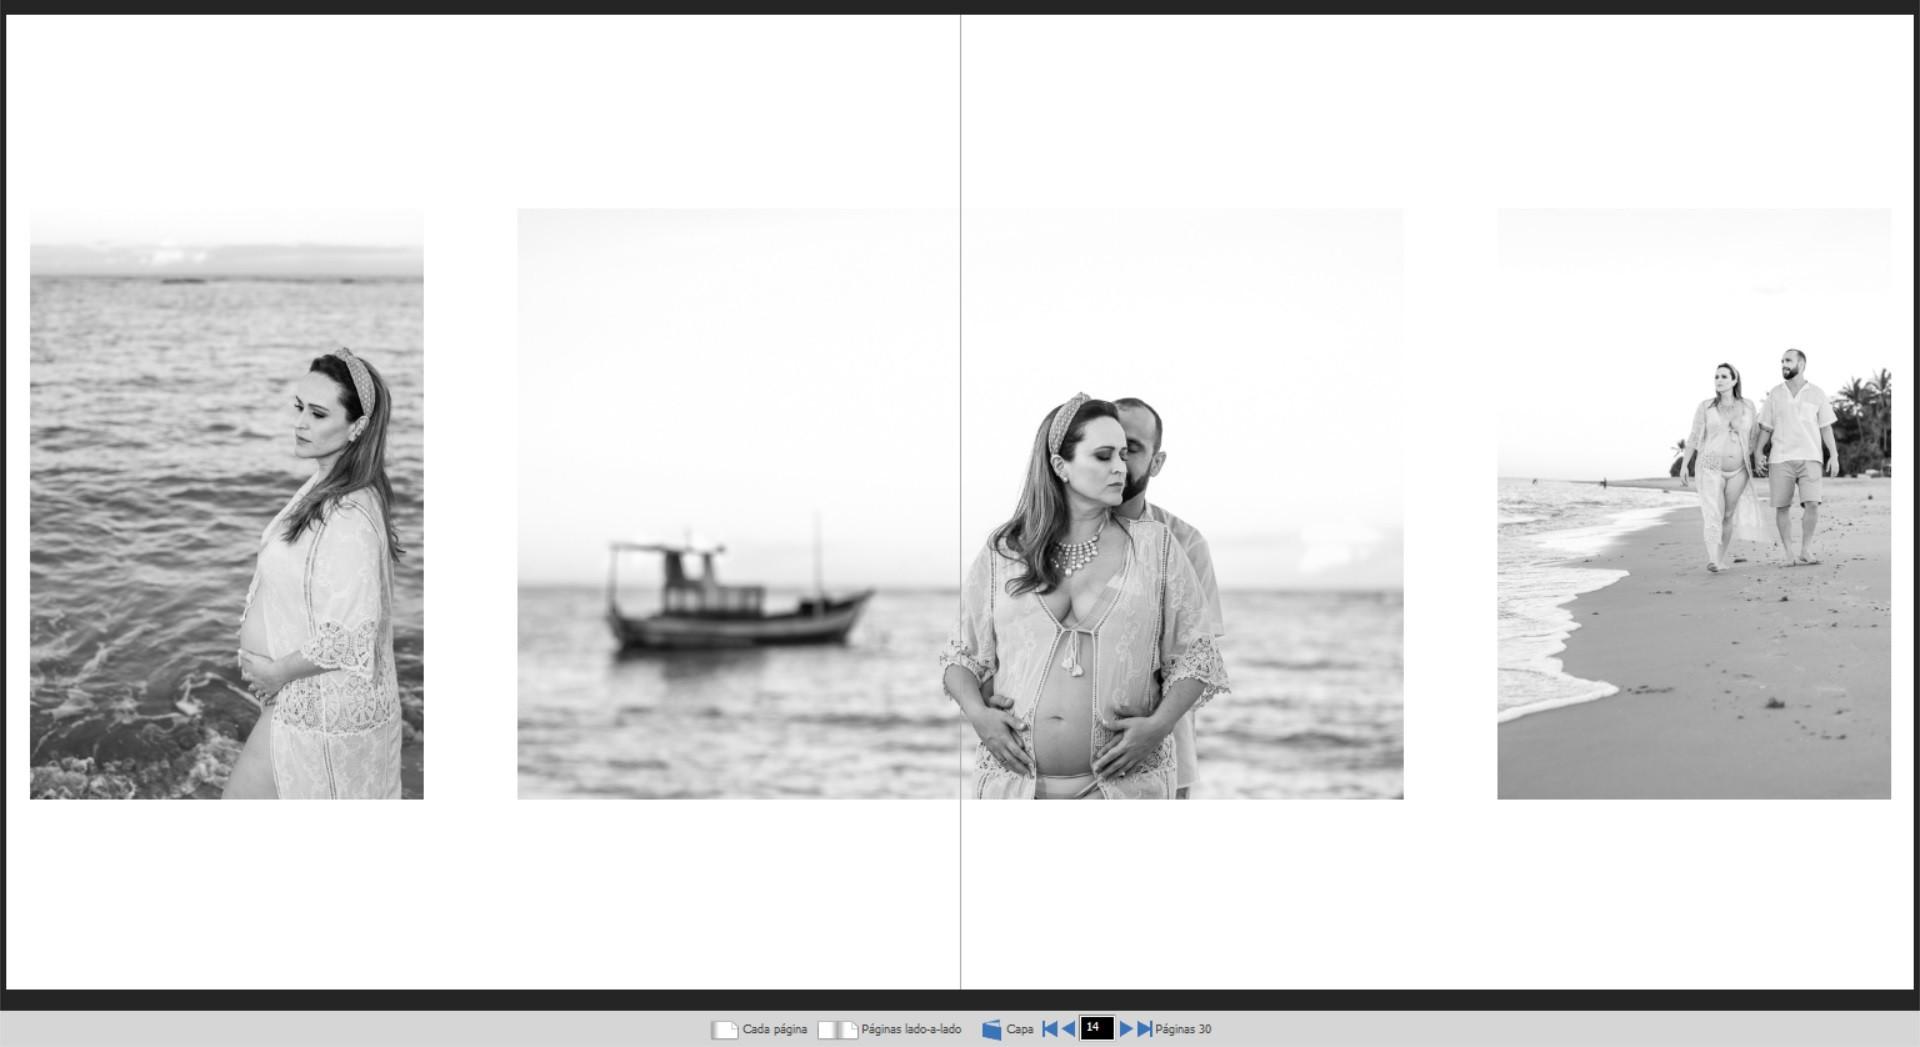 Izabela Album prova pag 14.jpg